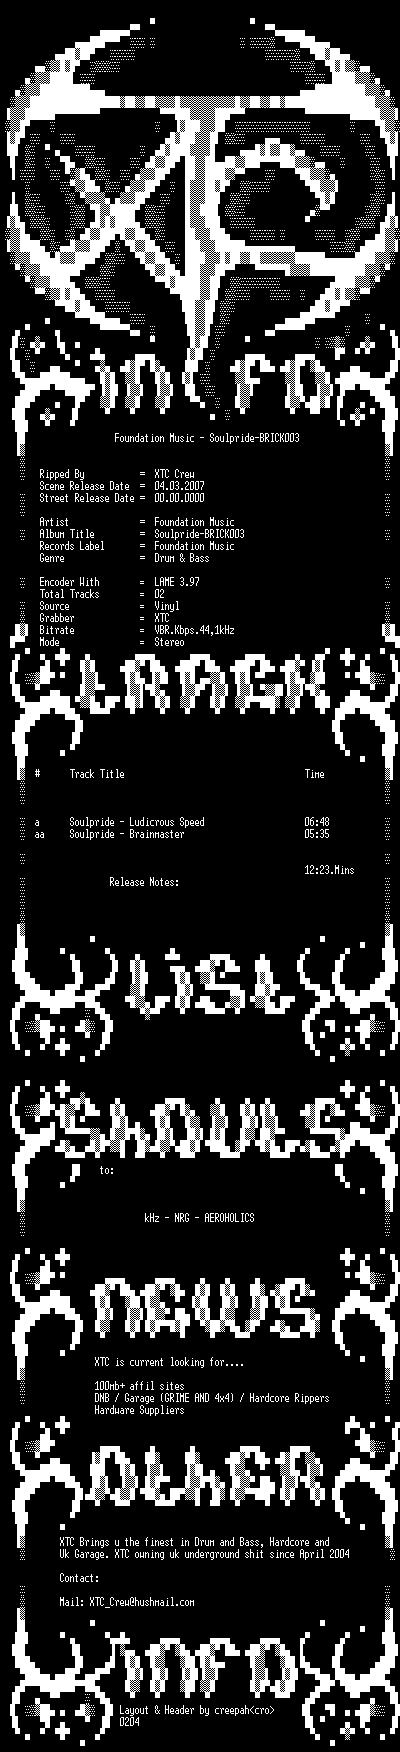 [DnB] Soulpride - BRICK003 - Foundation Music Brick010